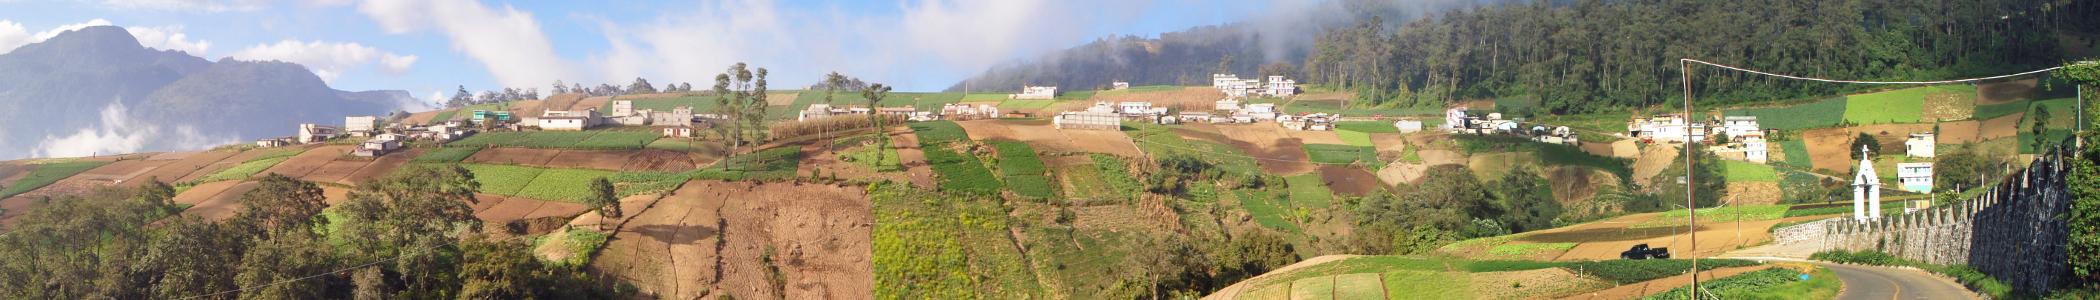 Western Highlands Guatemala Western Highlands Guatemala u2013